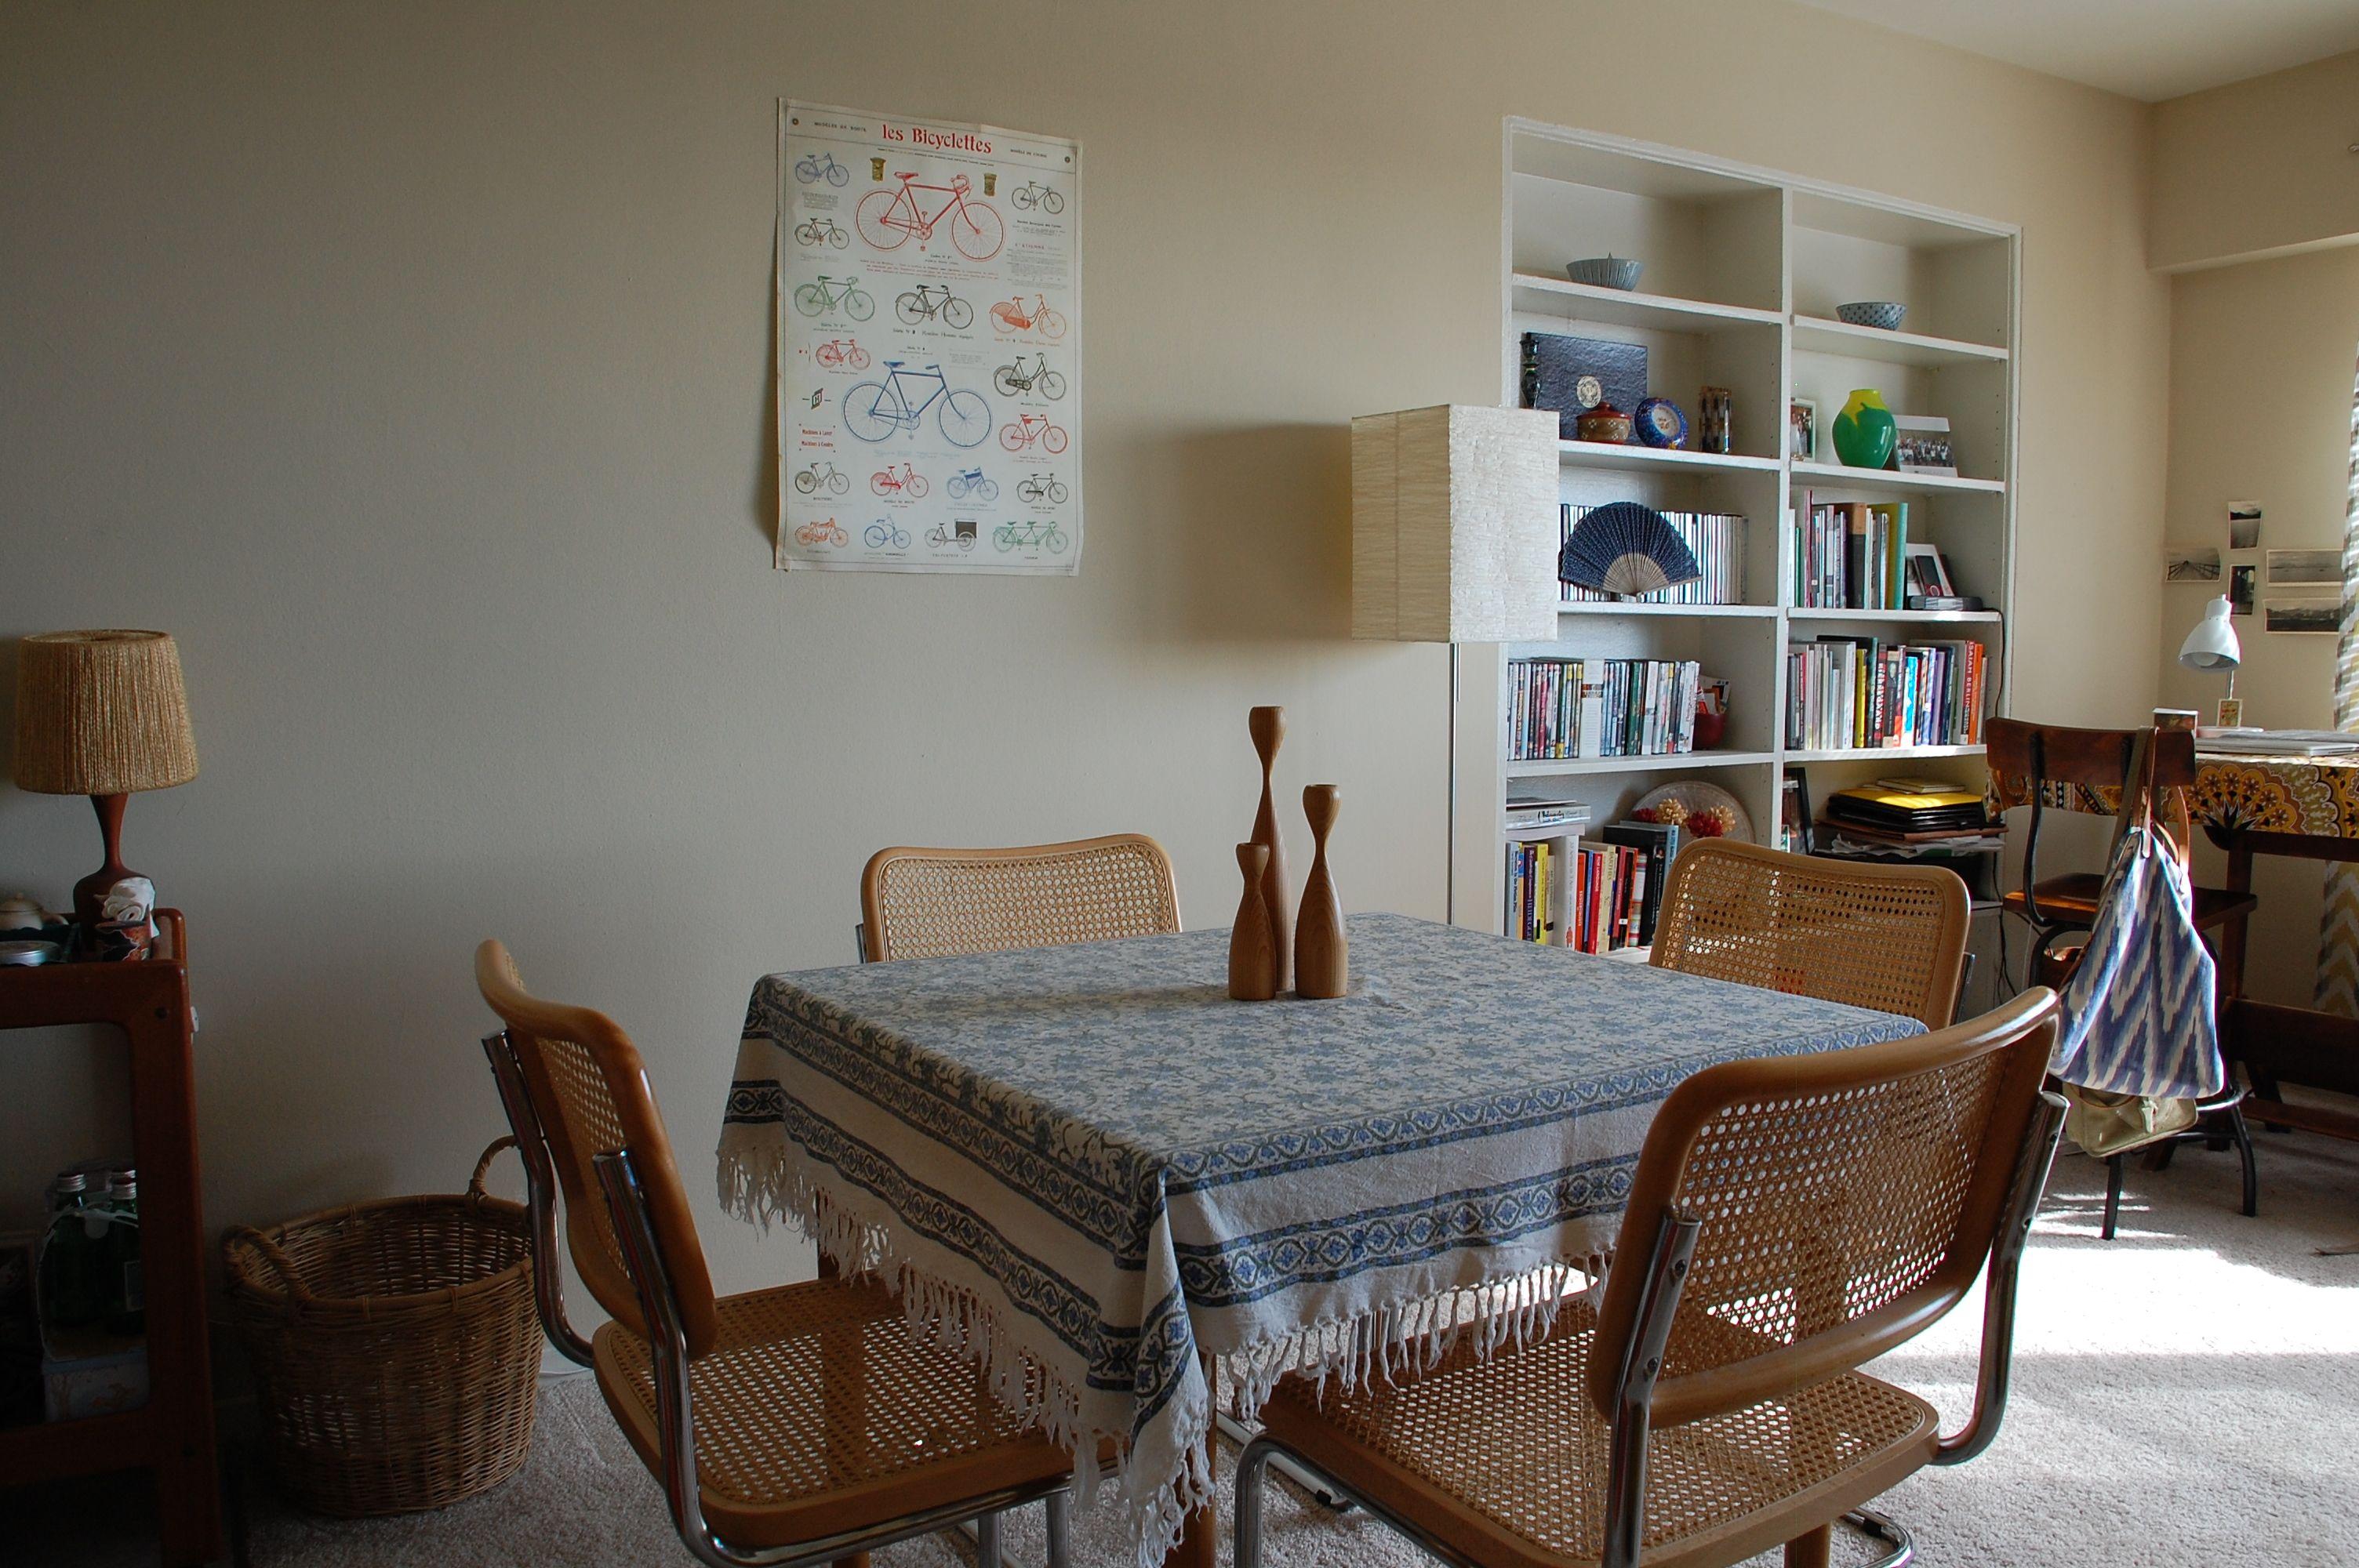 Apartment living on a student budget   gooollysandra